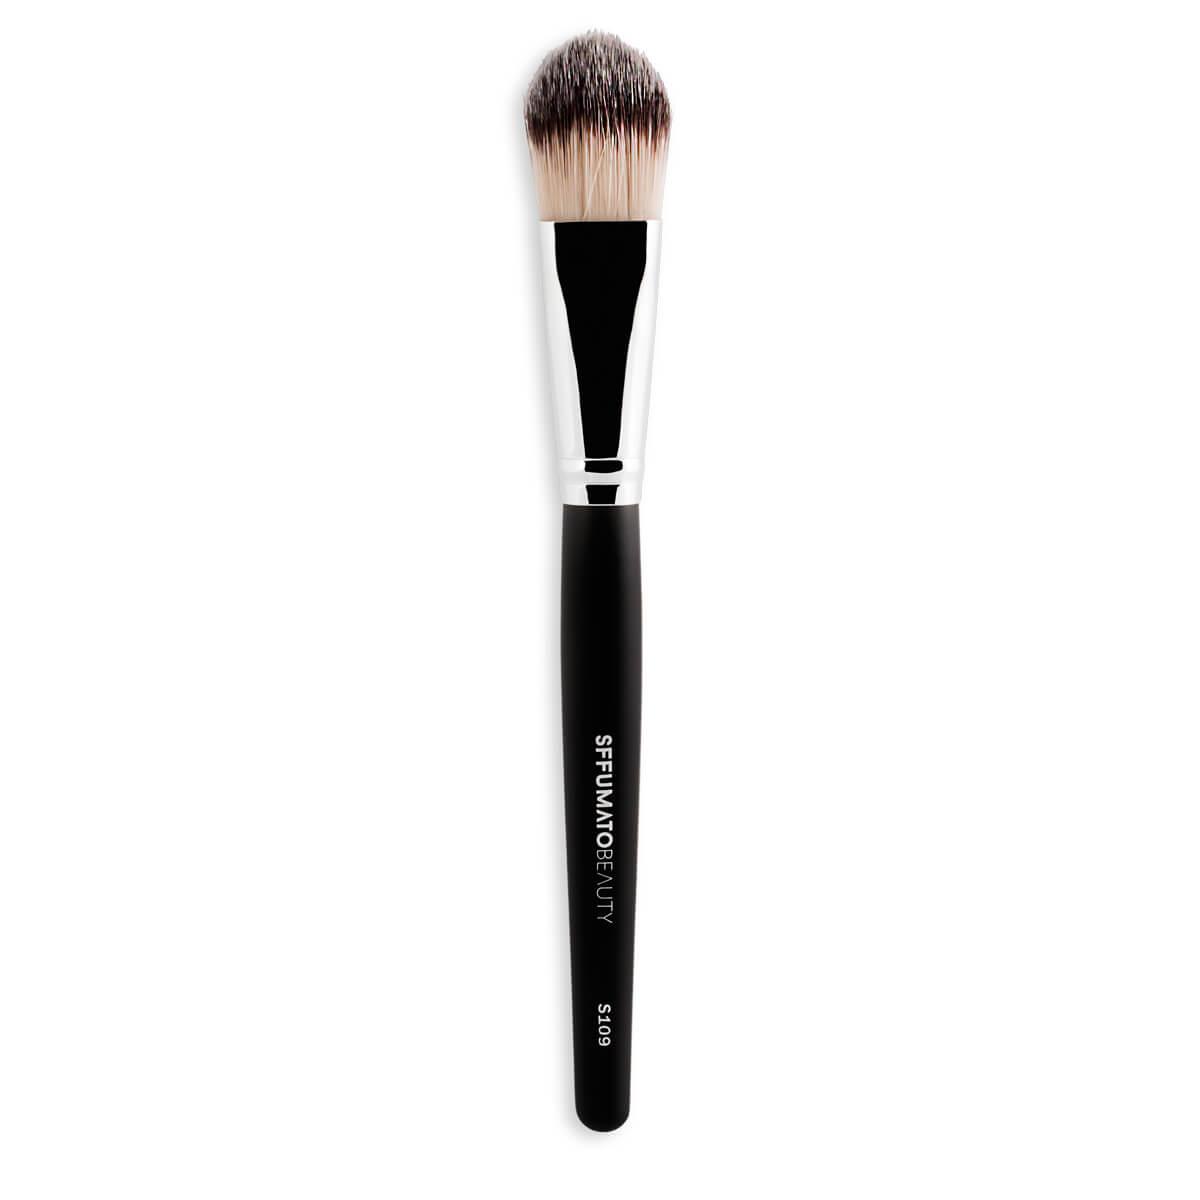 S109 - Pincel Para Base Língua De Gato Profissional Sffumato Beauty